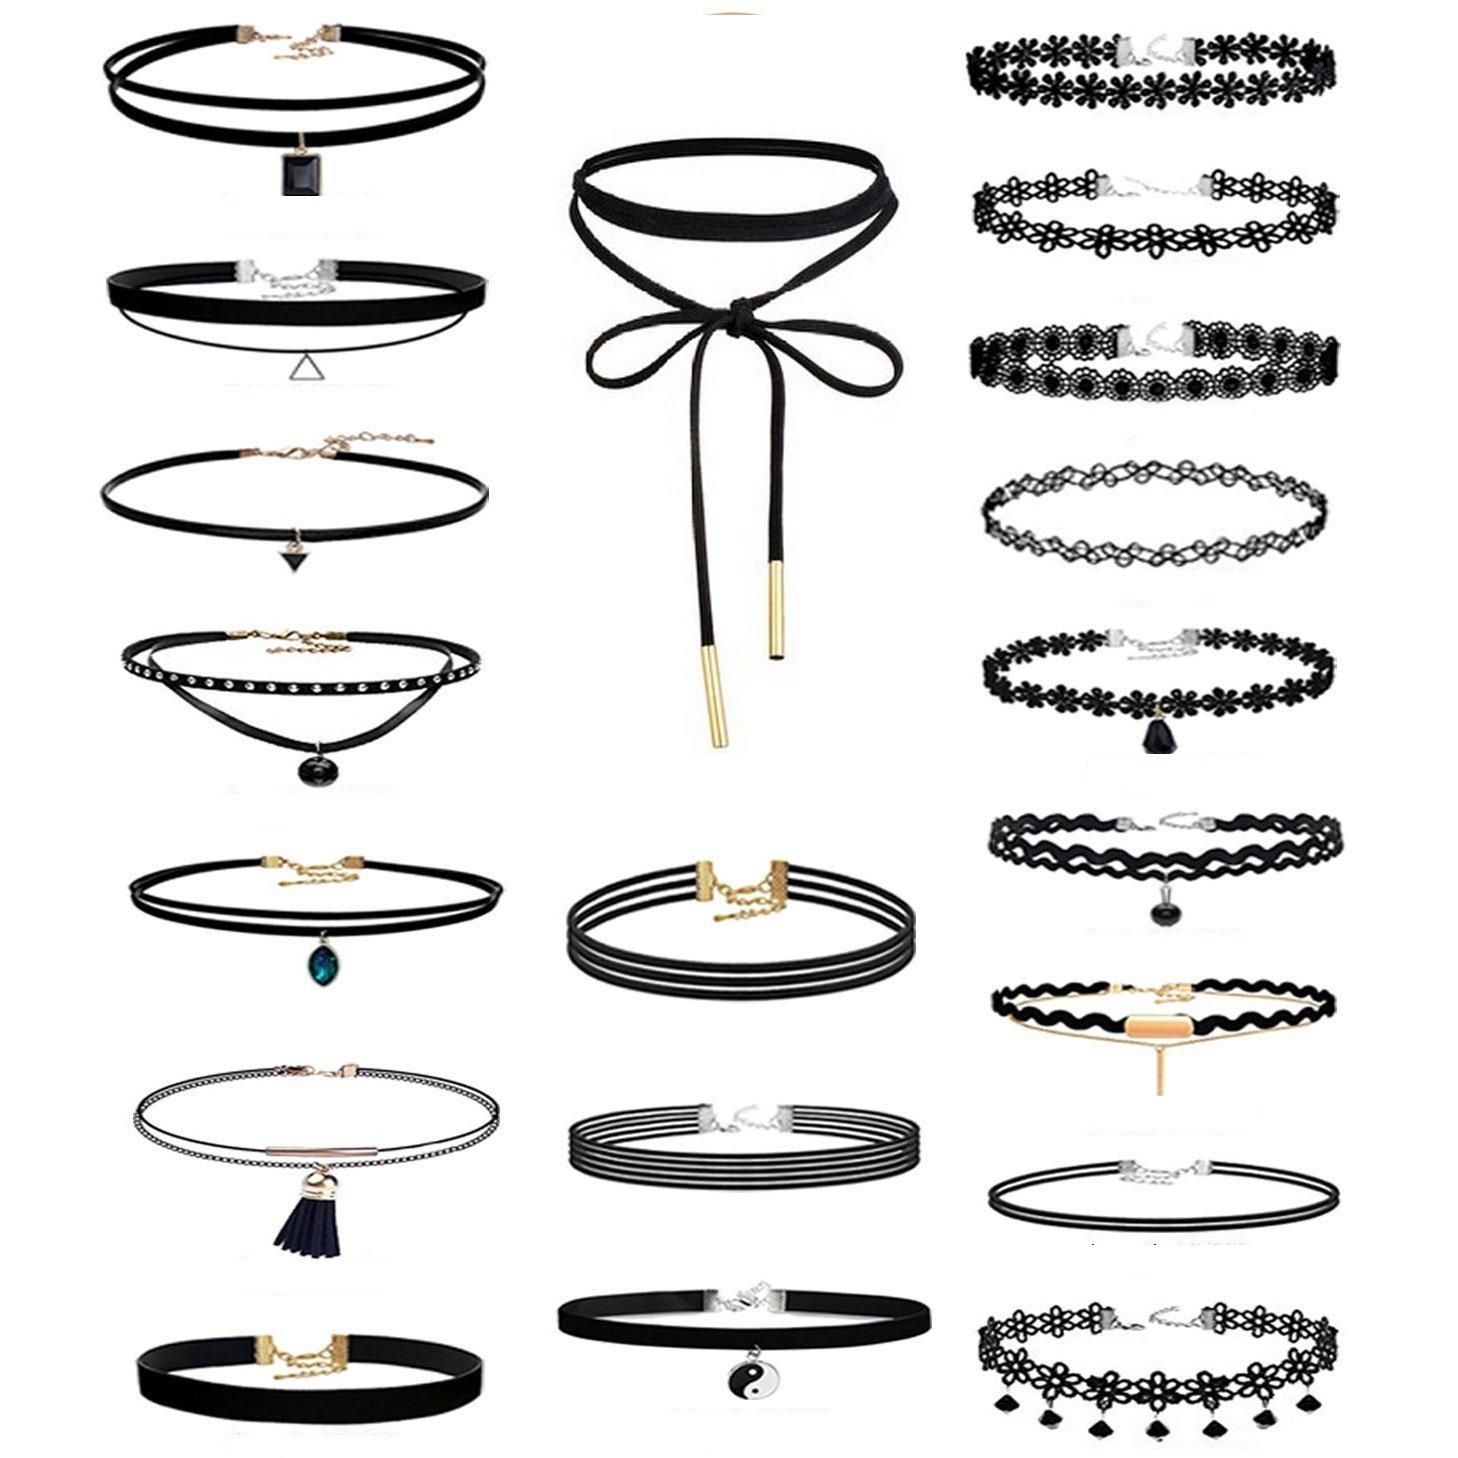 Black Choker Necklace Set for Women Girls Seo7562